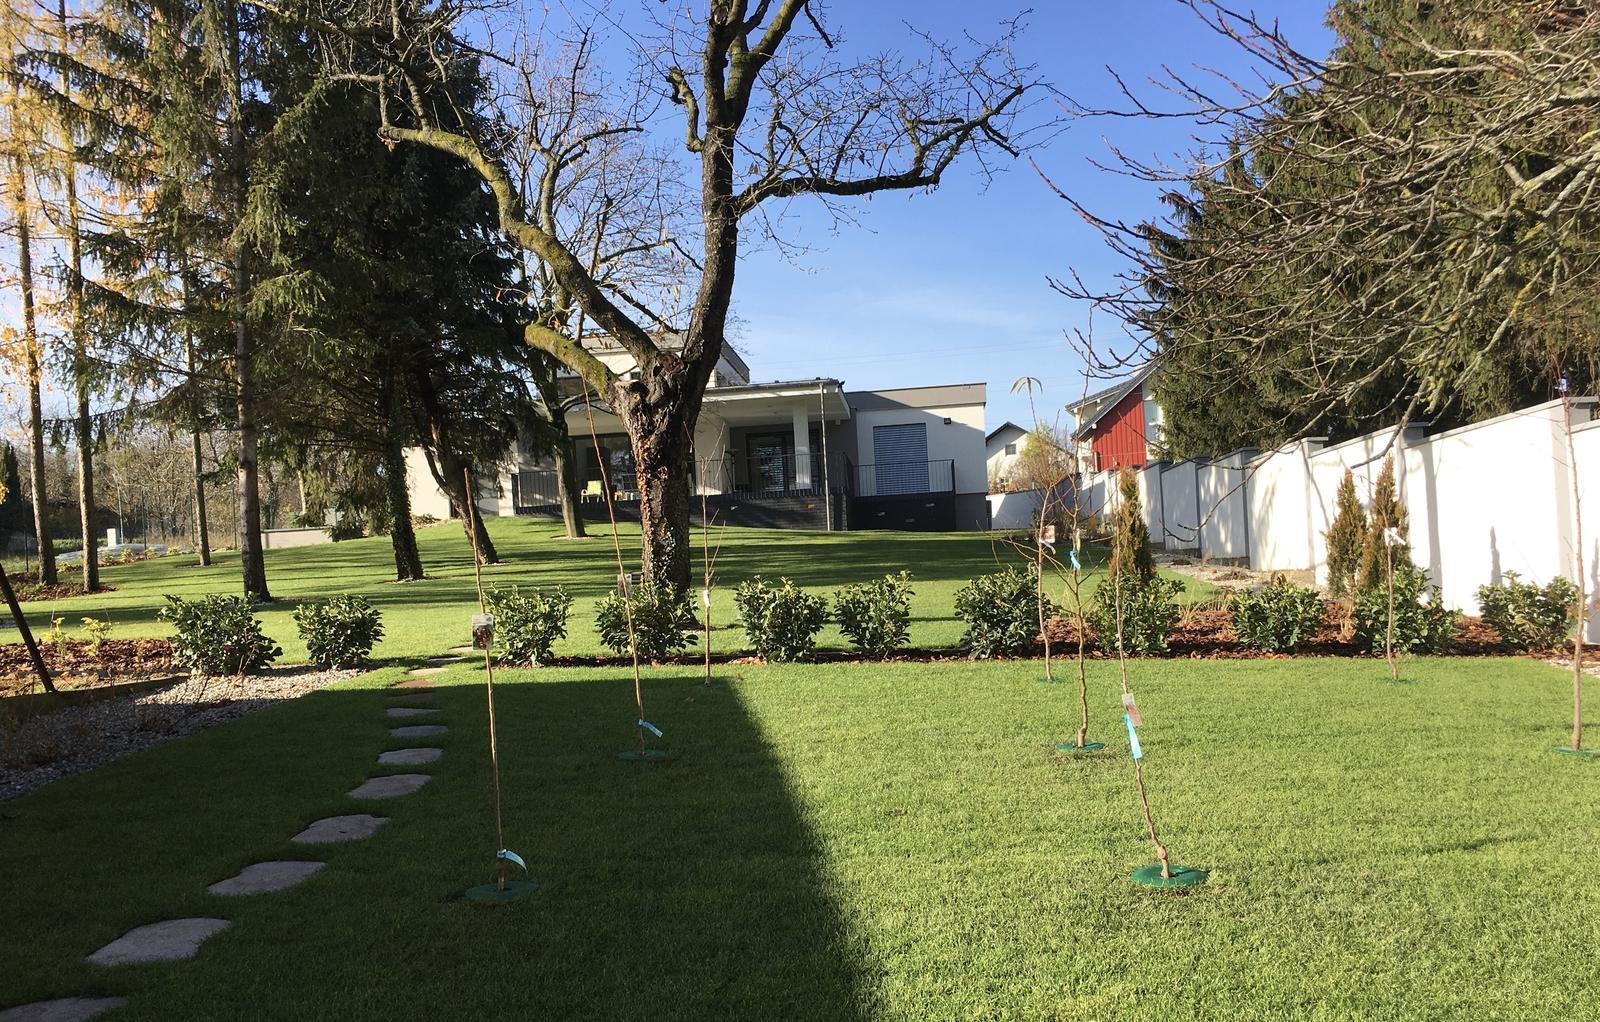 Vyvysene zahony & ovocne stromy - Ovocne stromceky zasadene